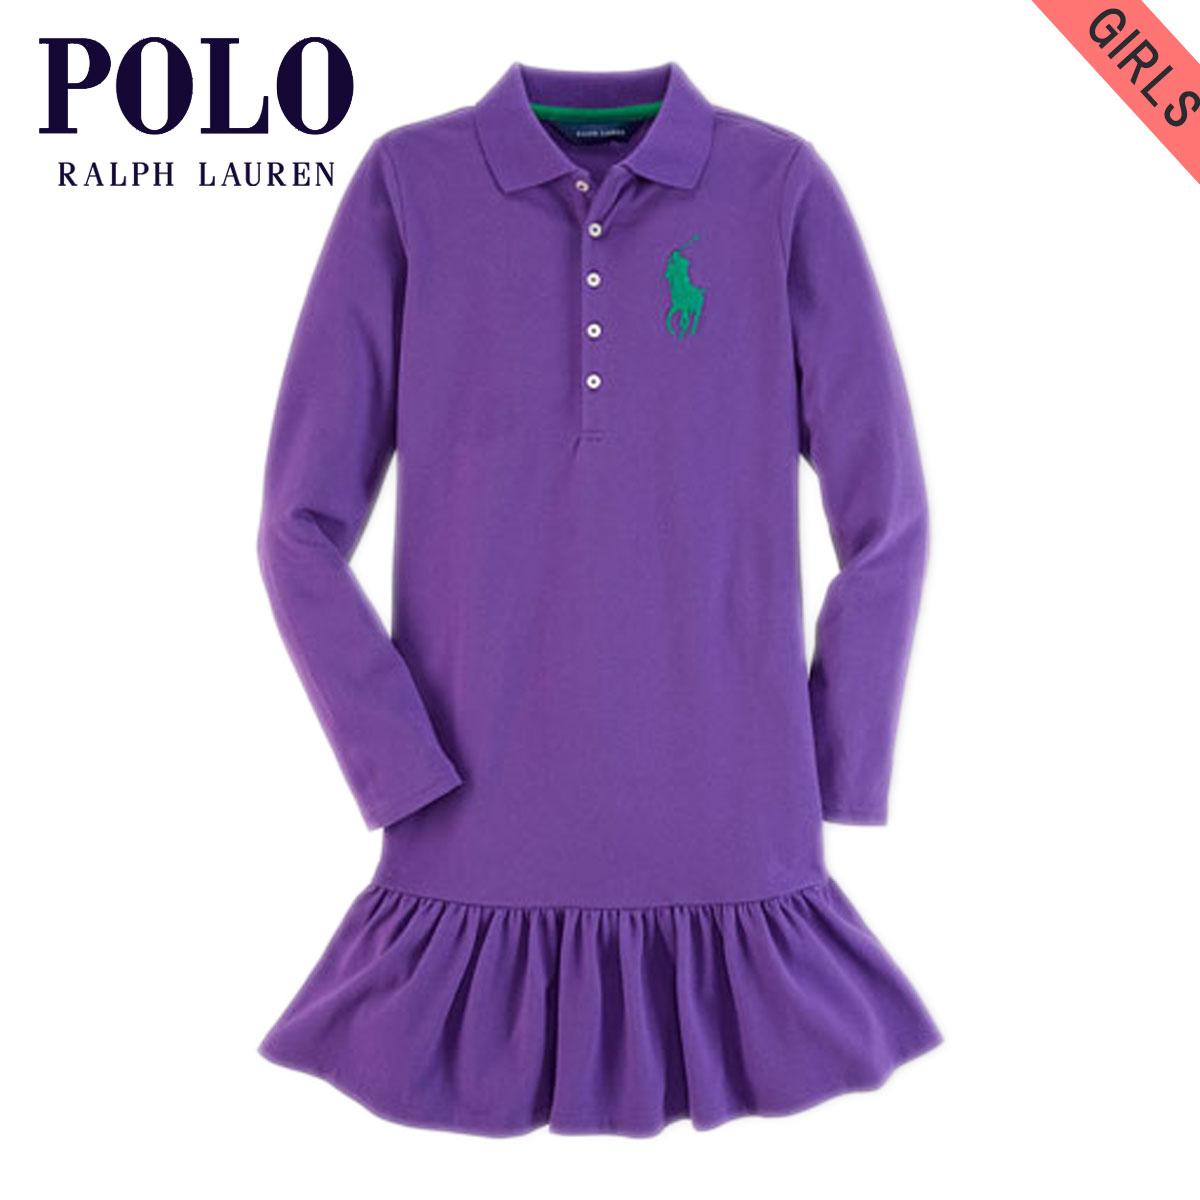 651ec6425 Poloralflorenkids POLO RALPH LAUREN CHILDREN genuine kids clothing girls  polo shirt BIG PONY COTTON DRESS 40925606